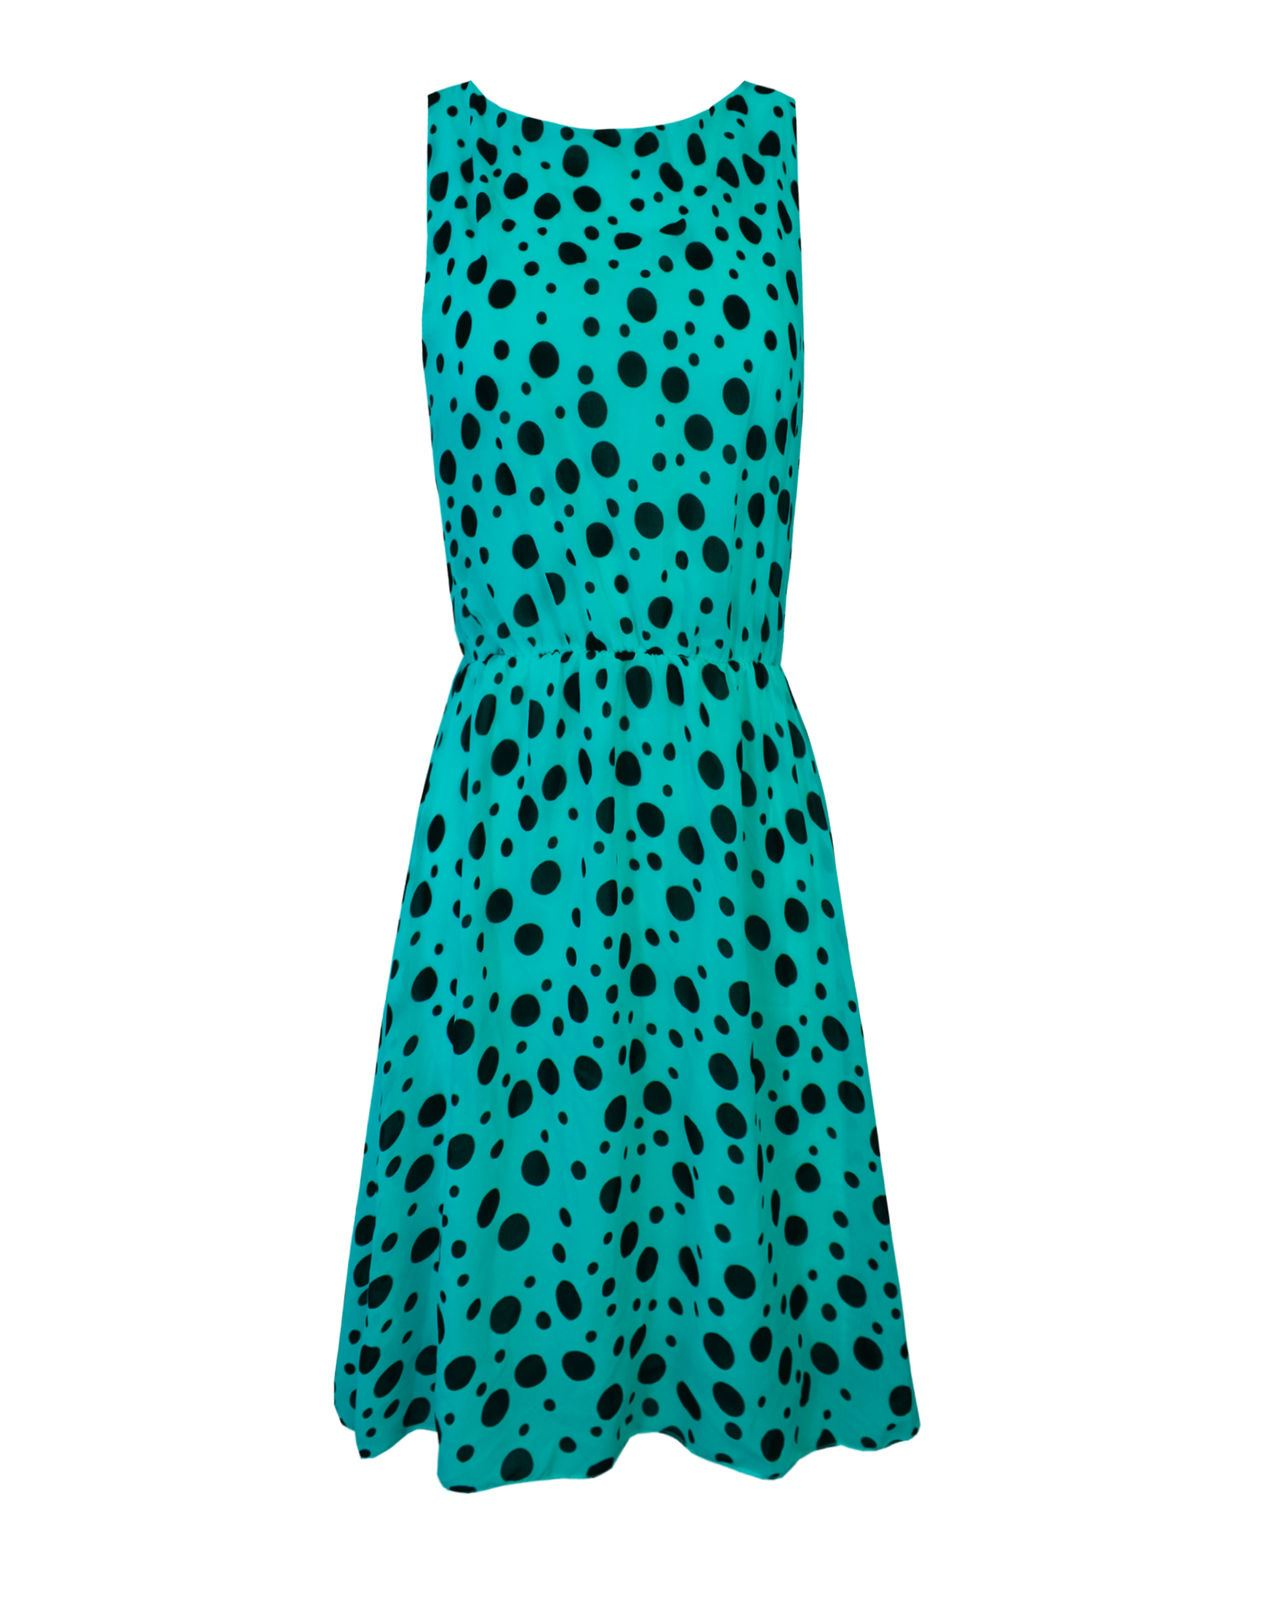 Senoras-mujeres-Swing-Acampanado-Skater-Polka-Dot-Detalle-Vestido-Cintura-Elastica-Top miniatura 5